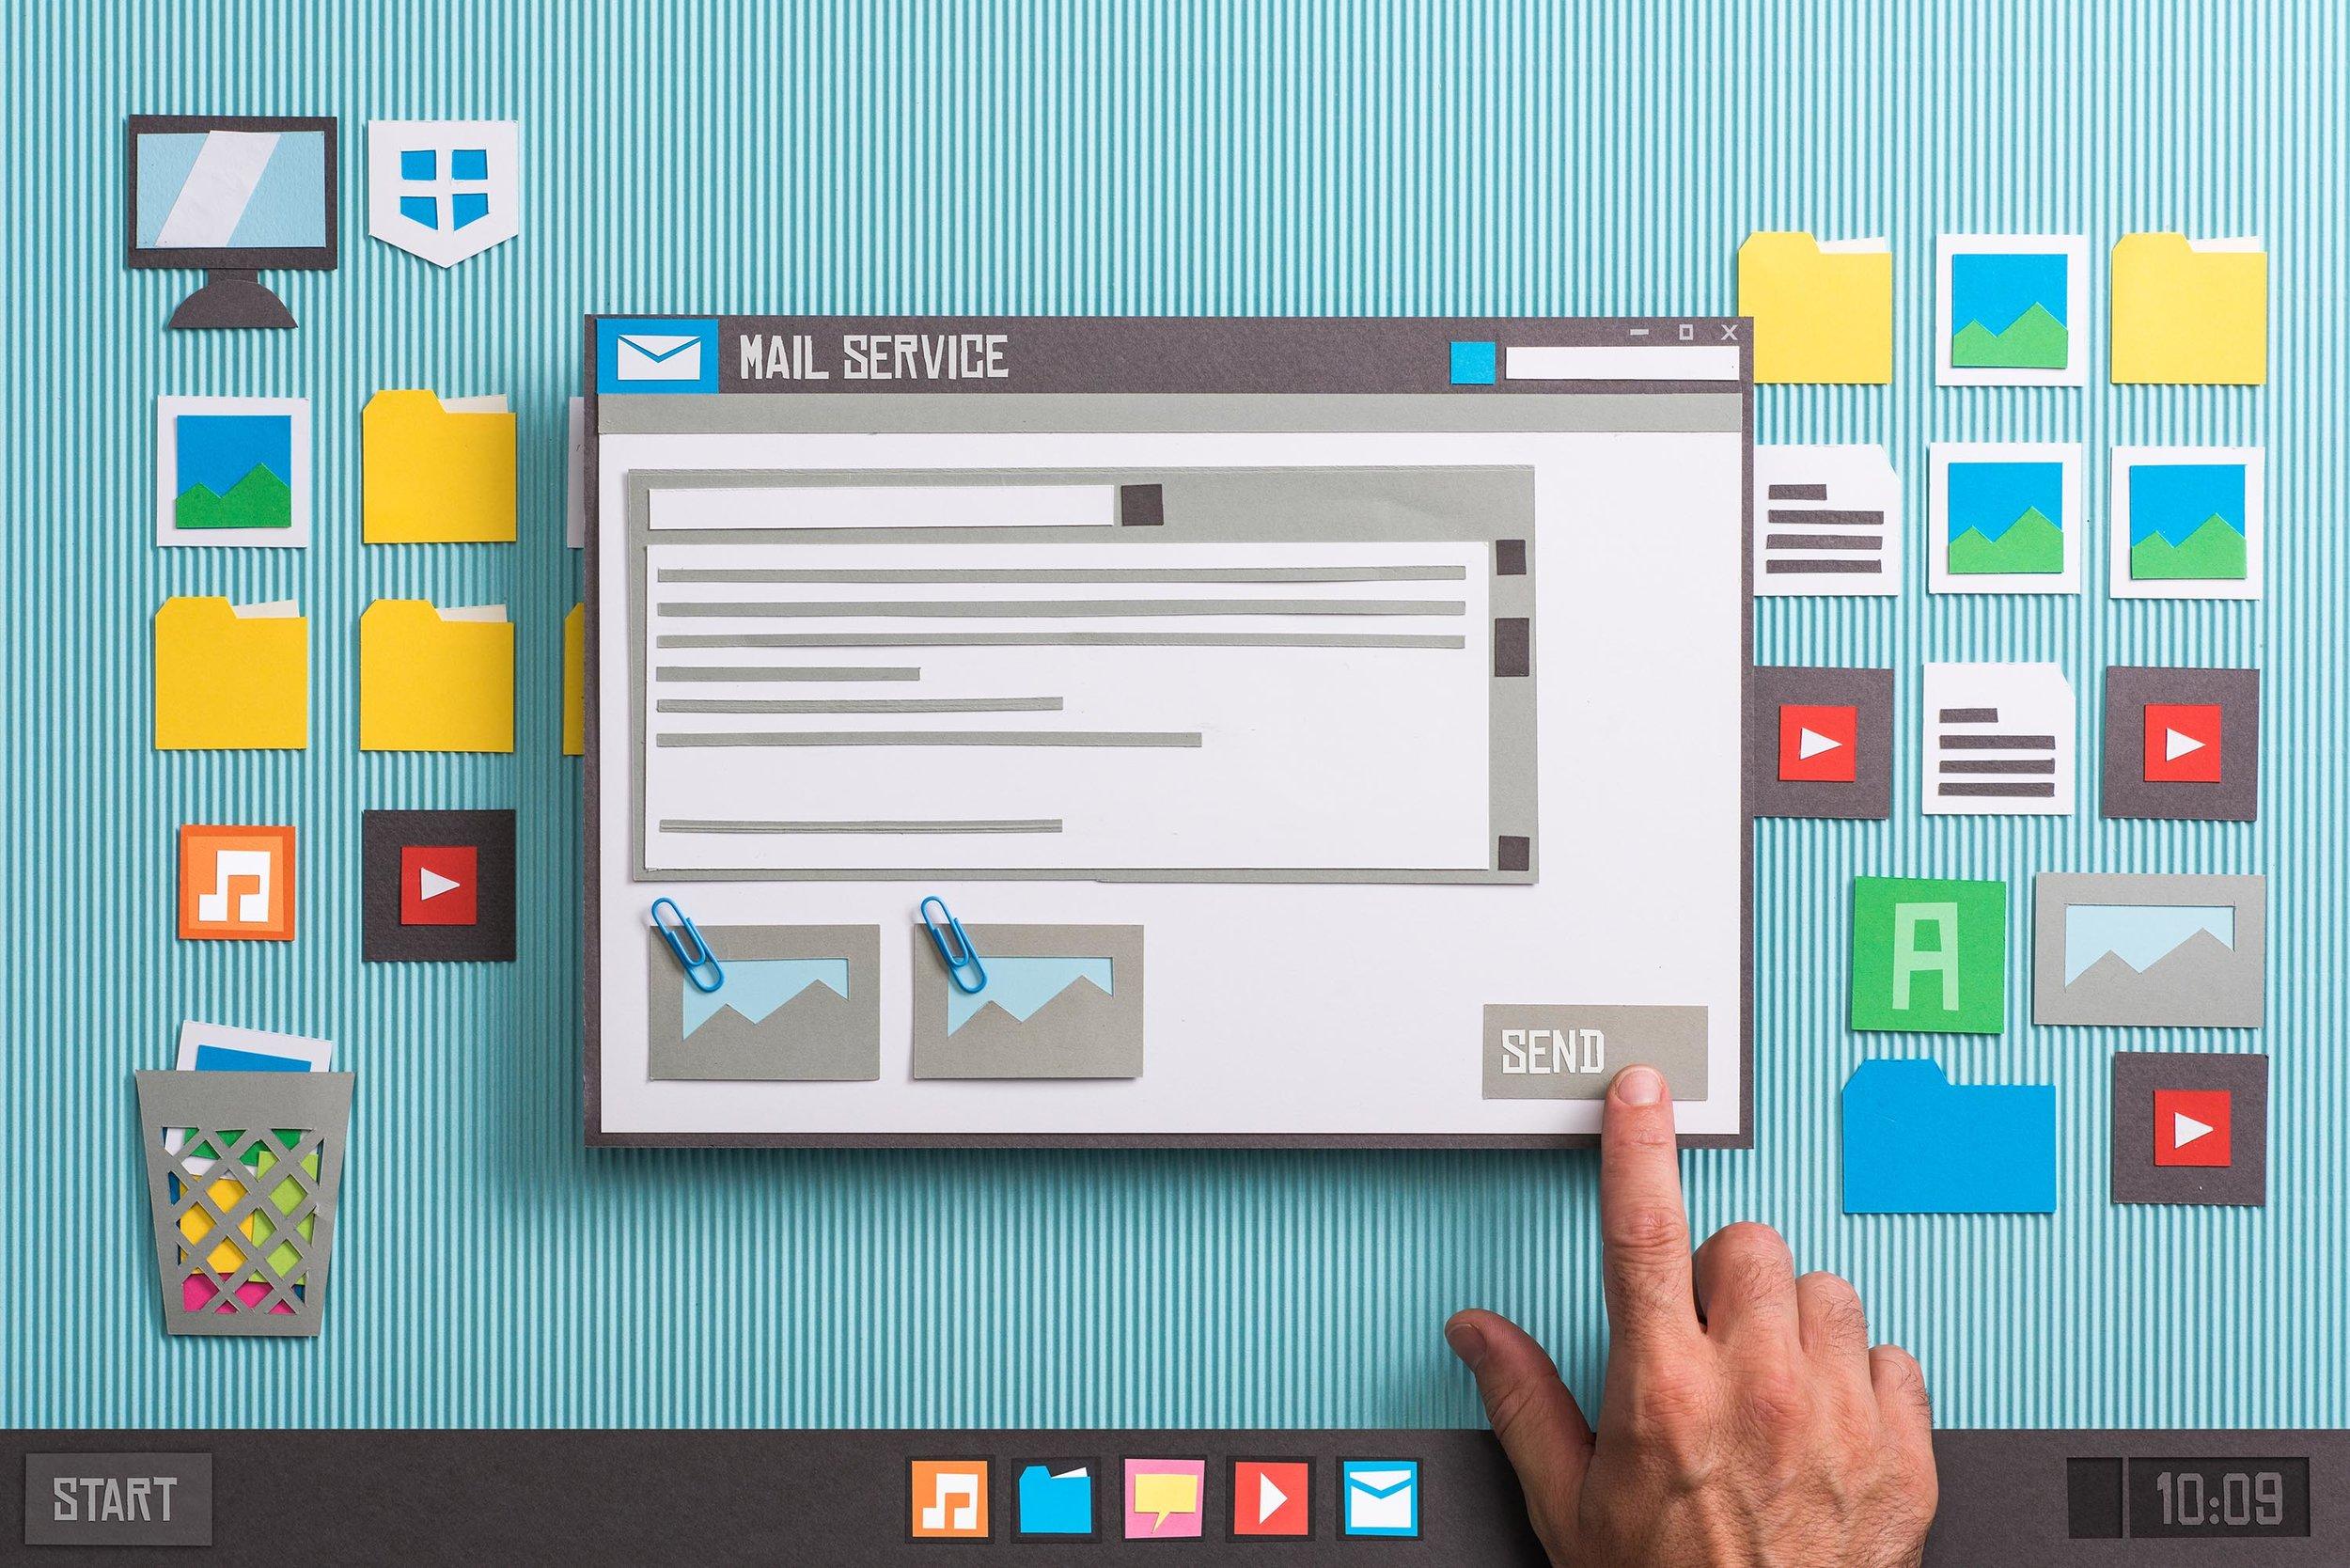 e-mail-service-PZ952WJ copy.jpg